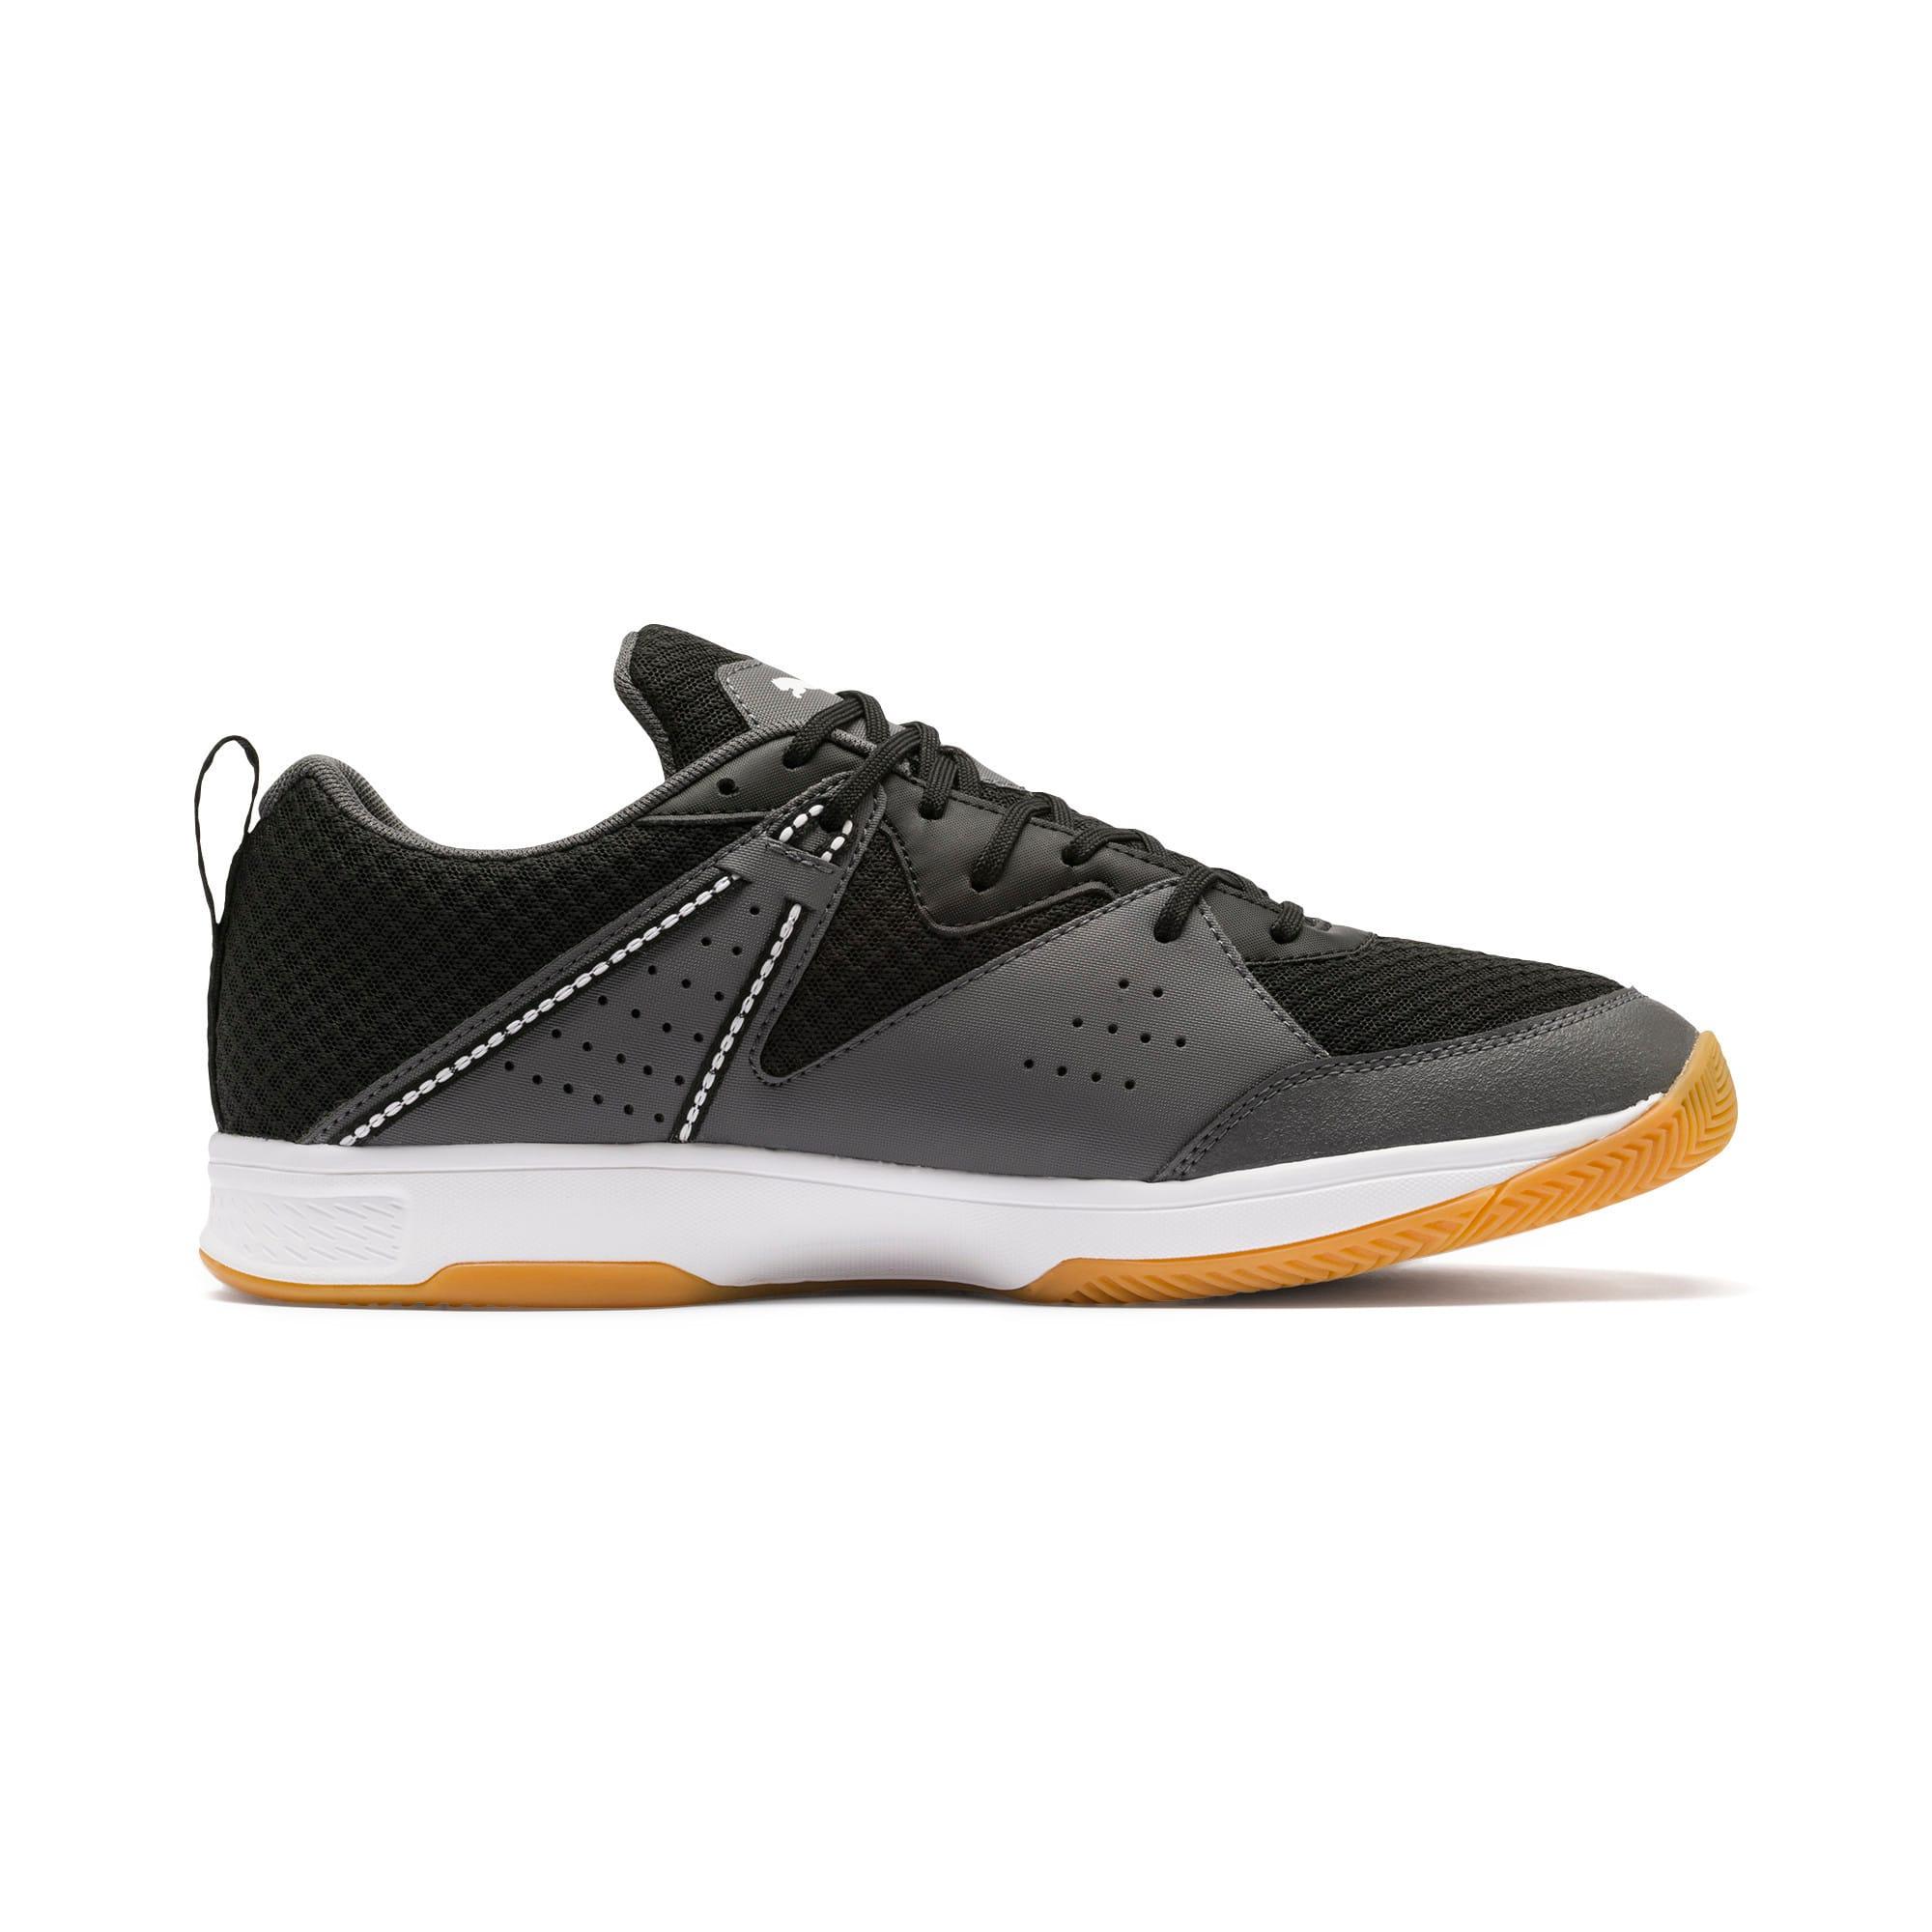 Thumbnail 5 of PUMA Stoker.18 Indoor Training Shoes, Black-White-Iron Gate-Gum, medium-IND